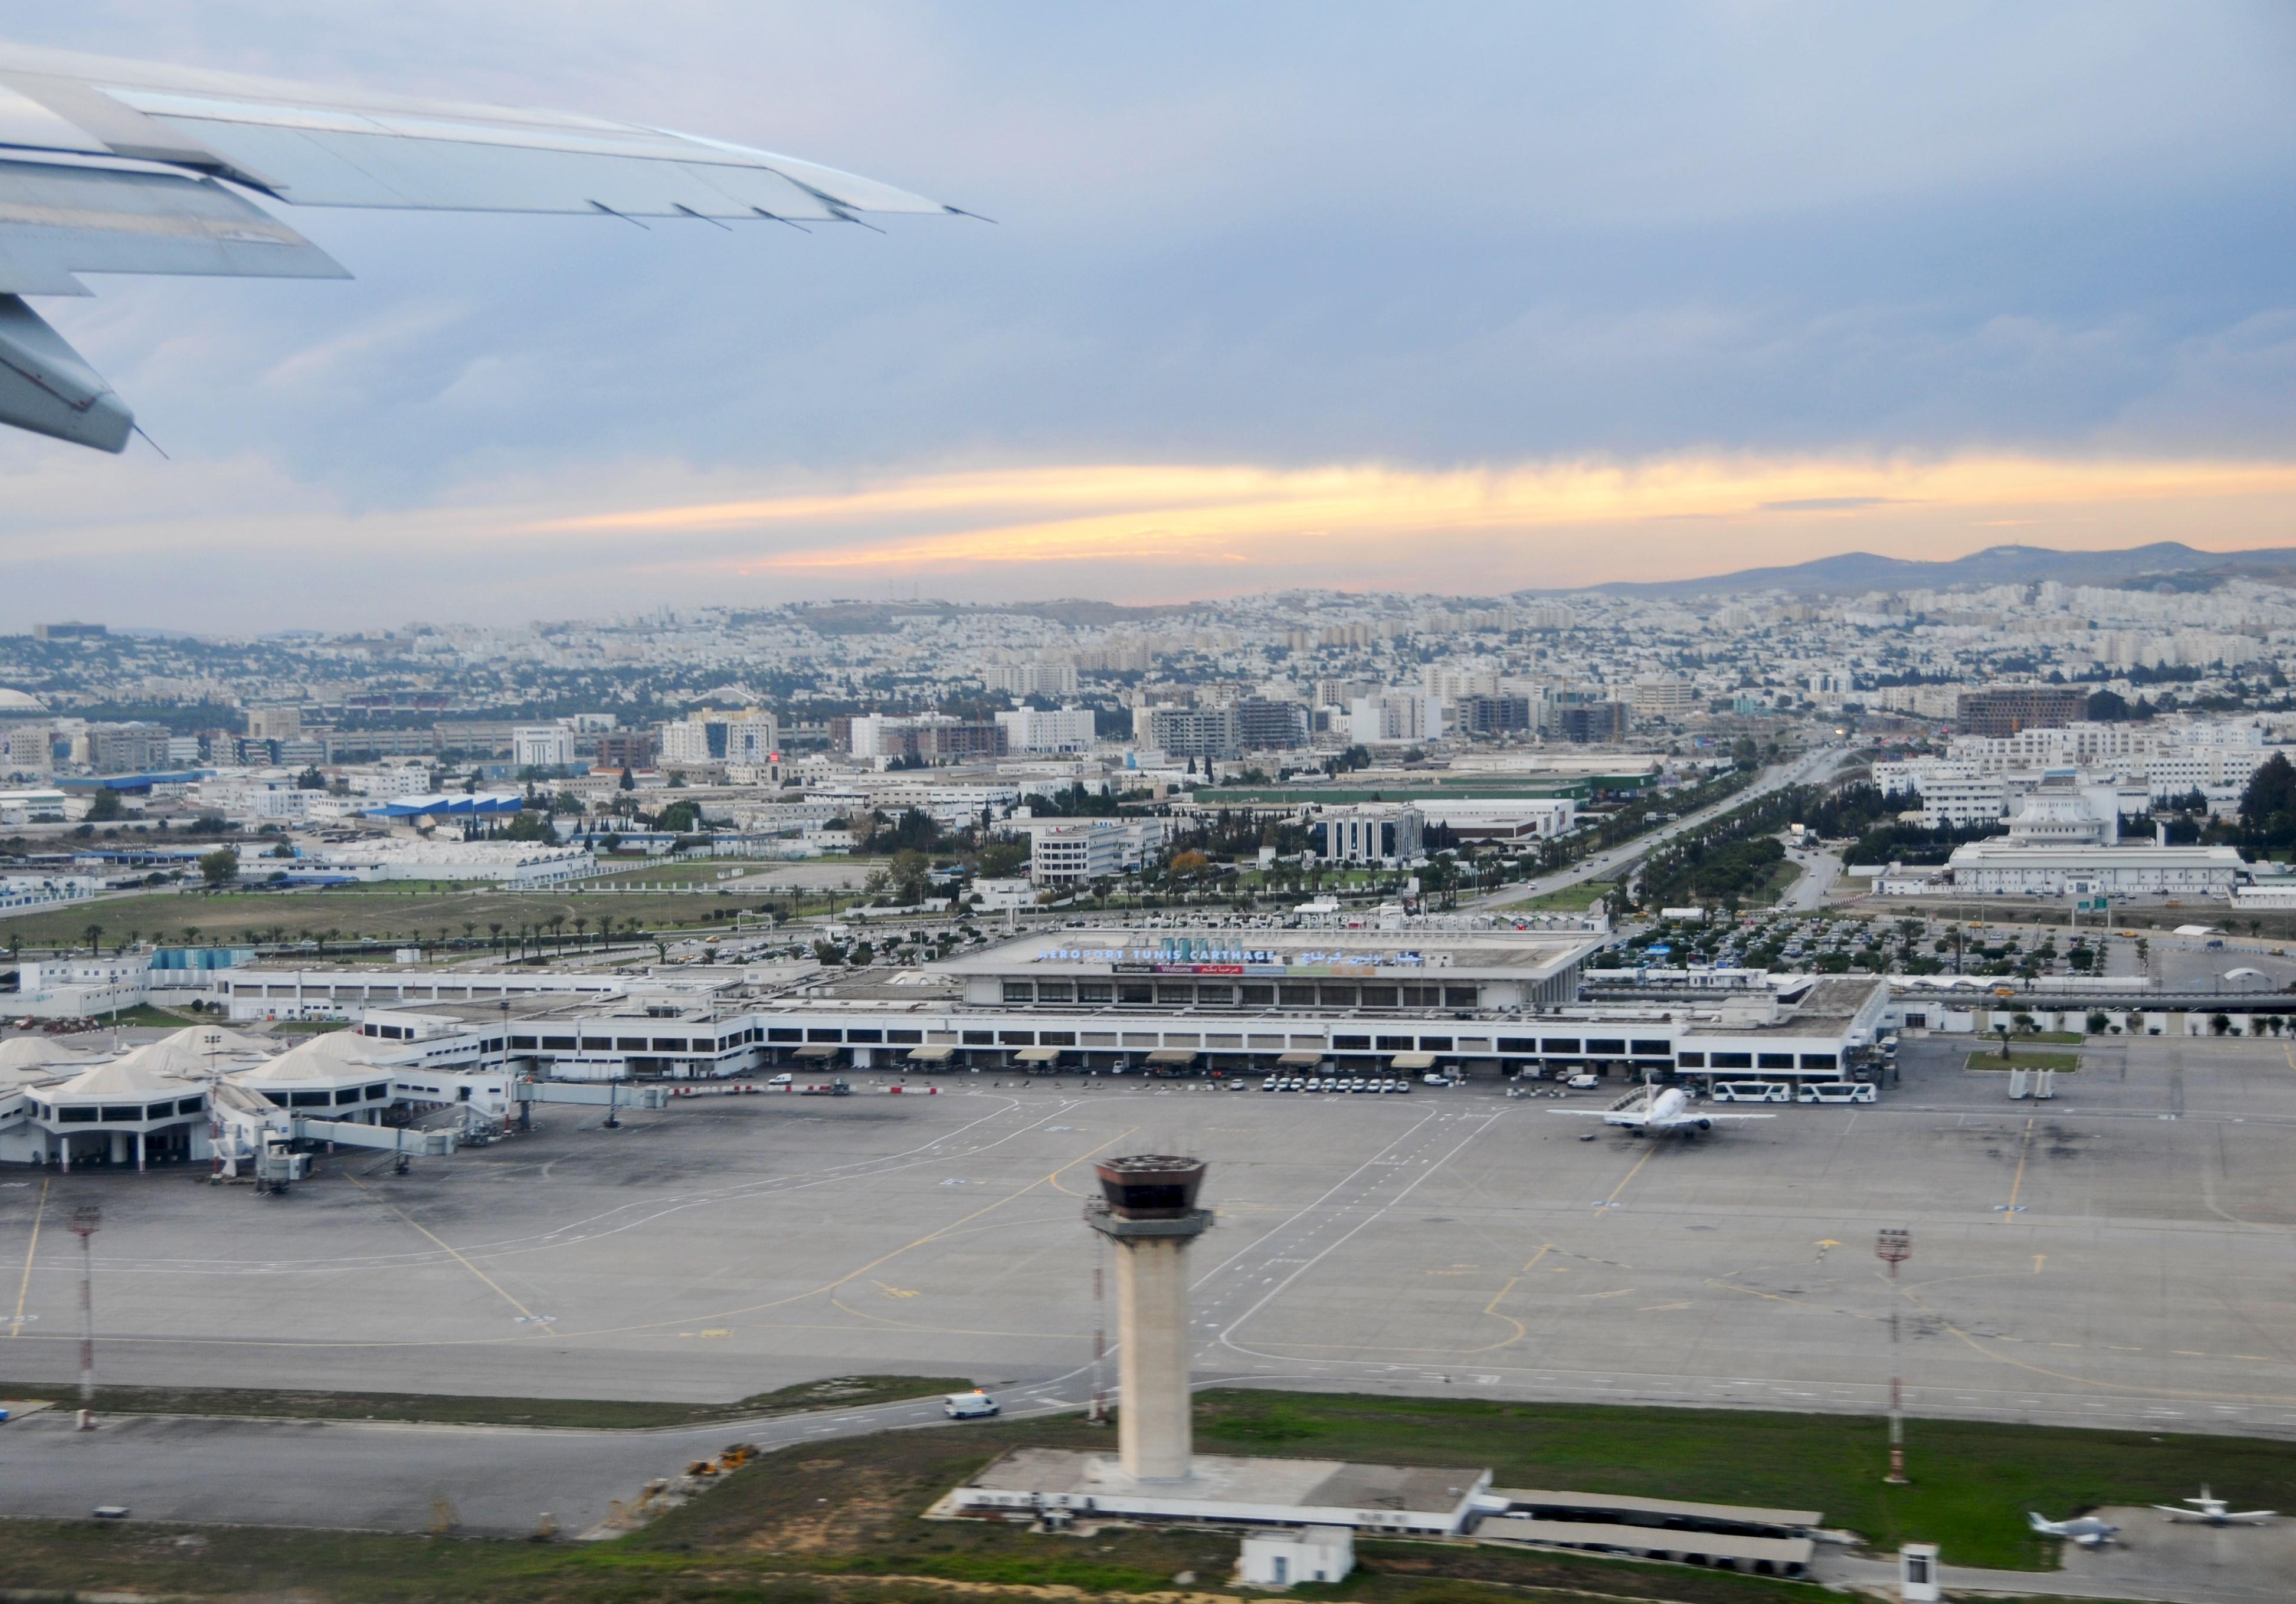 File:Tunis-Carthage Airport.jpg - Wikimedia Commons